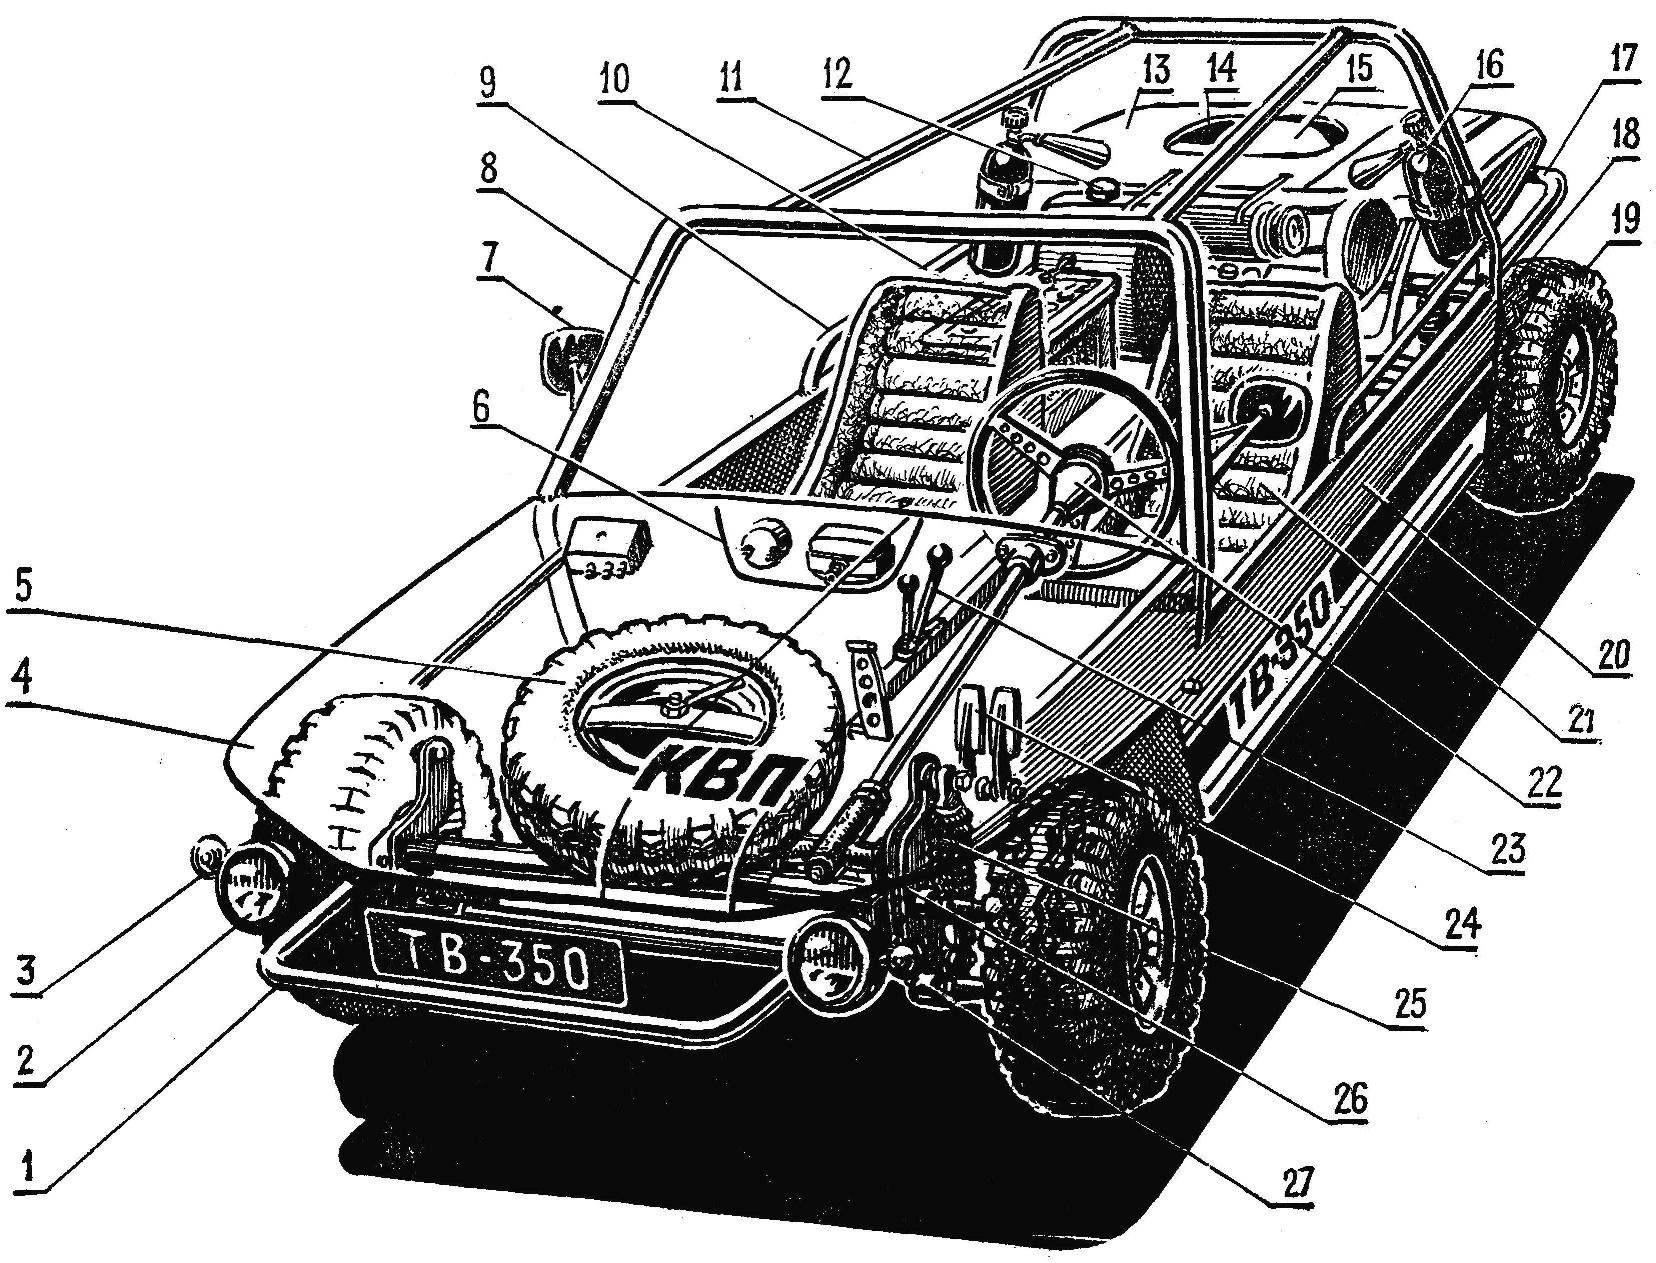 Рис. 1. Общая компоновка микроавтомобиля багги «КВП»